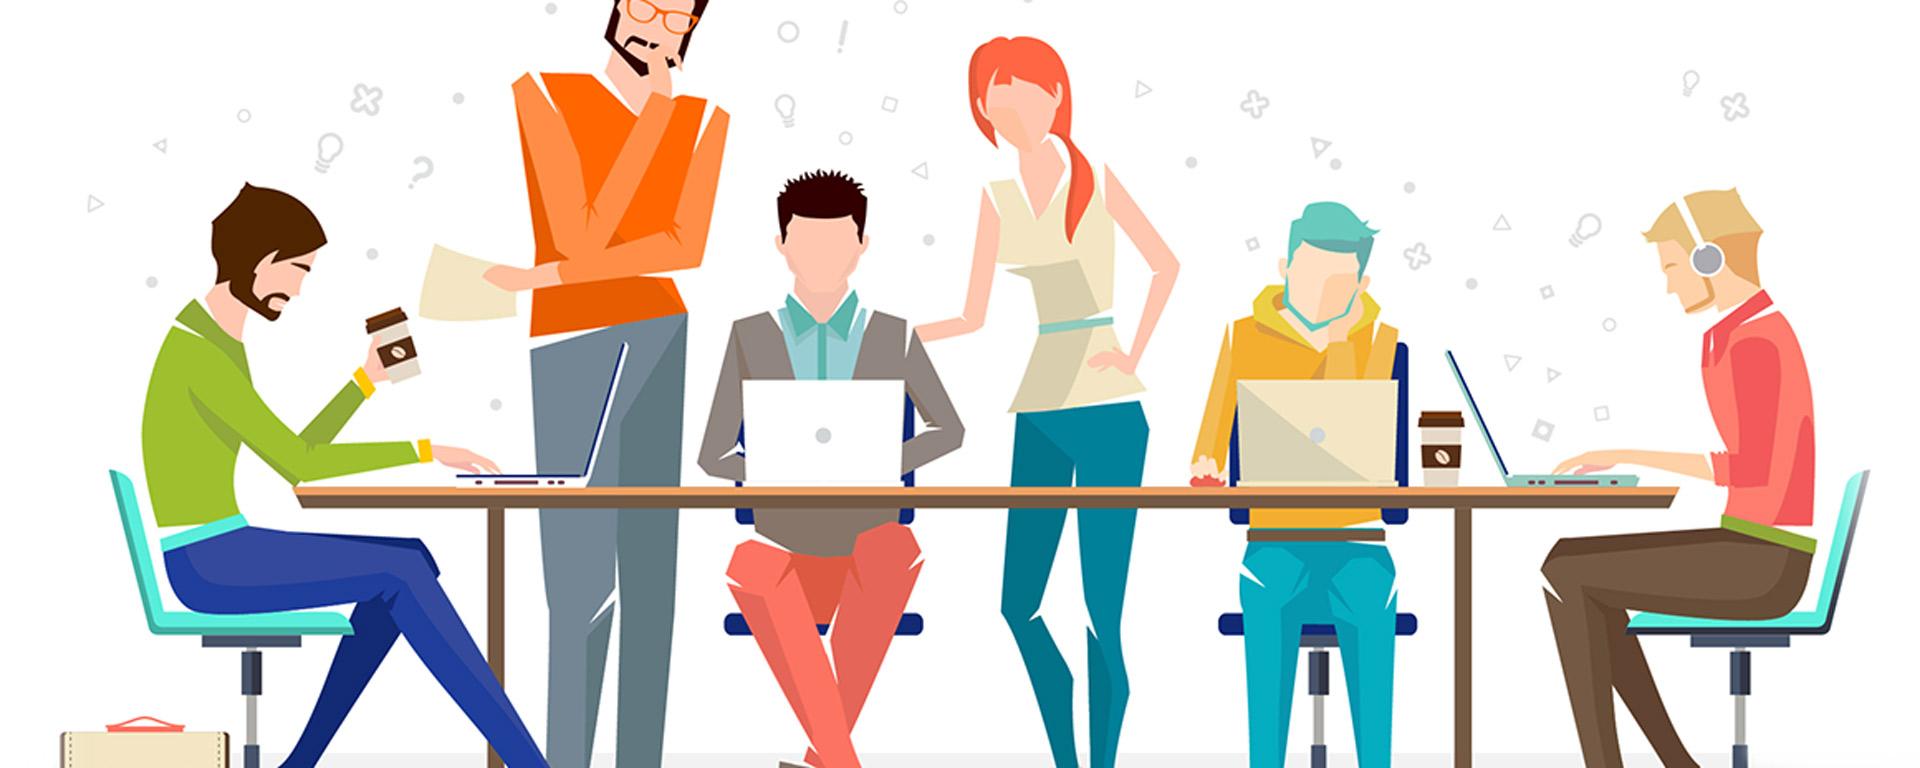 Как найти работу в интернете на дому без вложений